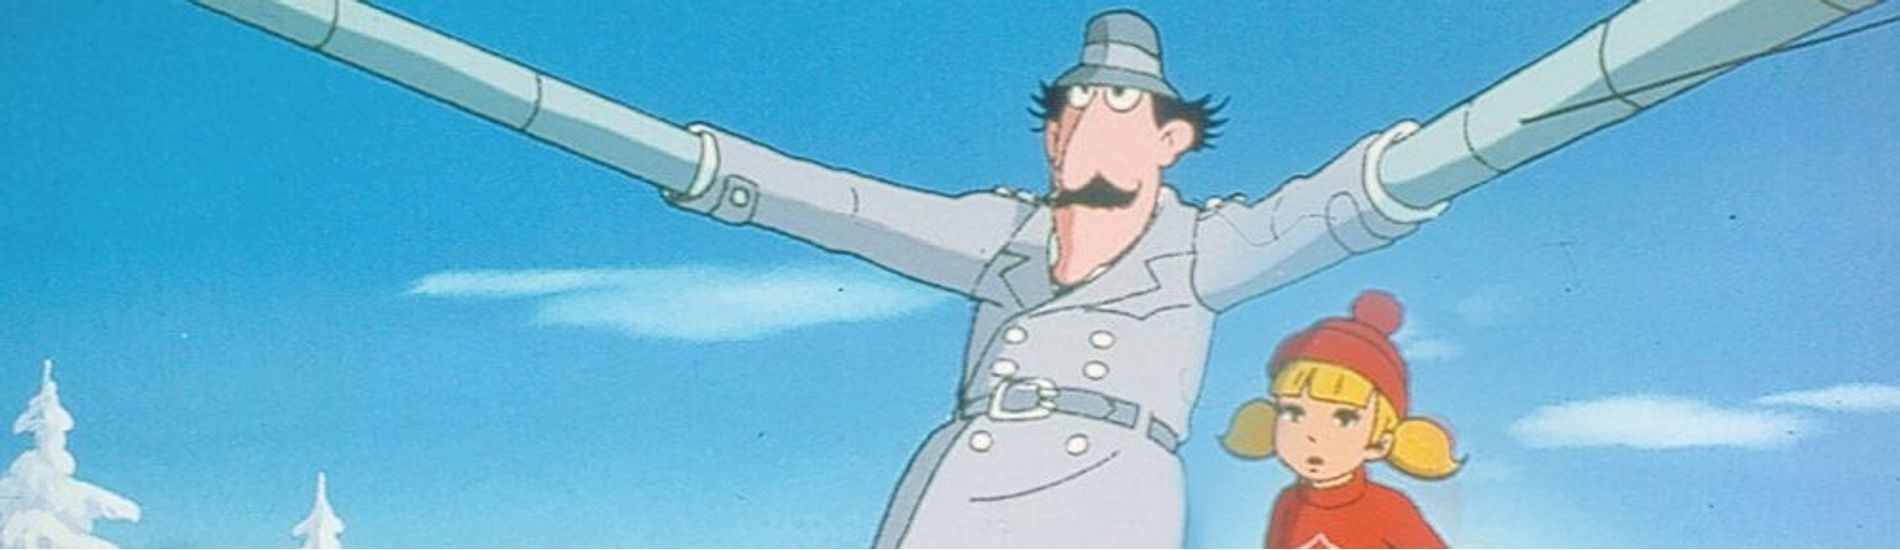 Coloriage inspecteur gadget 11 coloriage inspecteur gadget coloriages dessins animes - Inspecteur gadget dessin anime ...